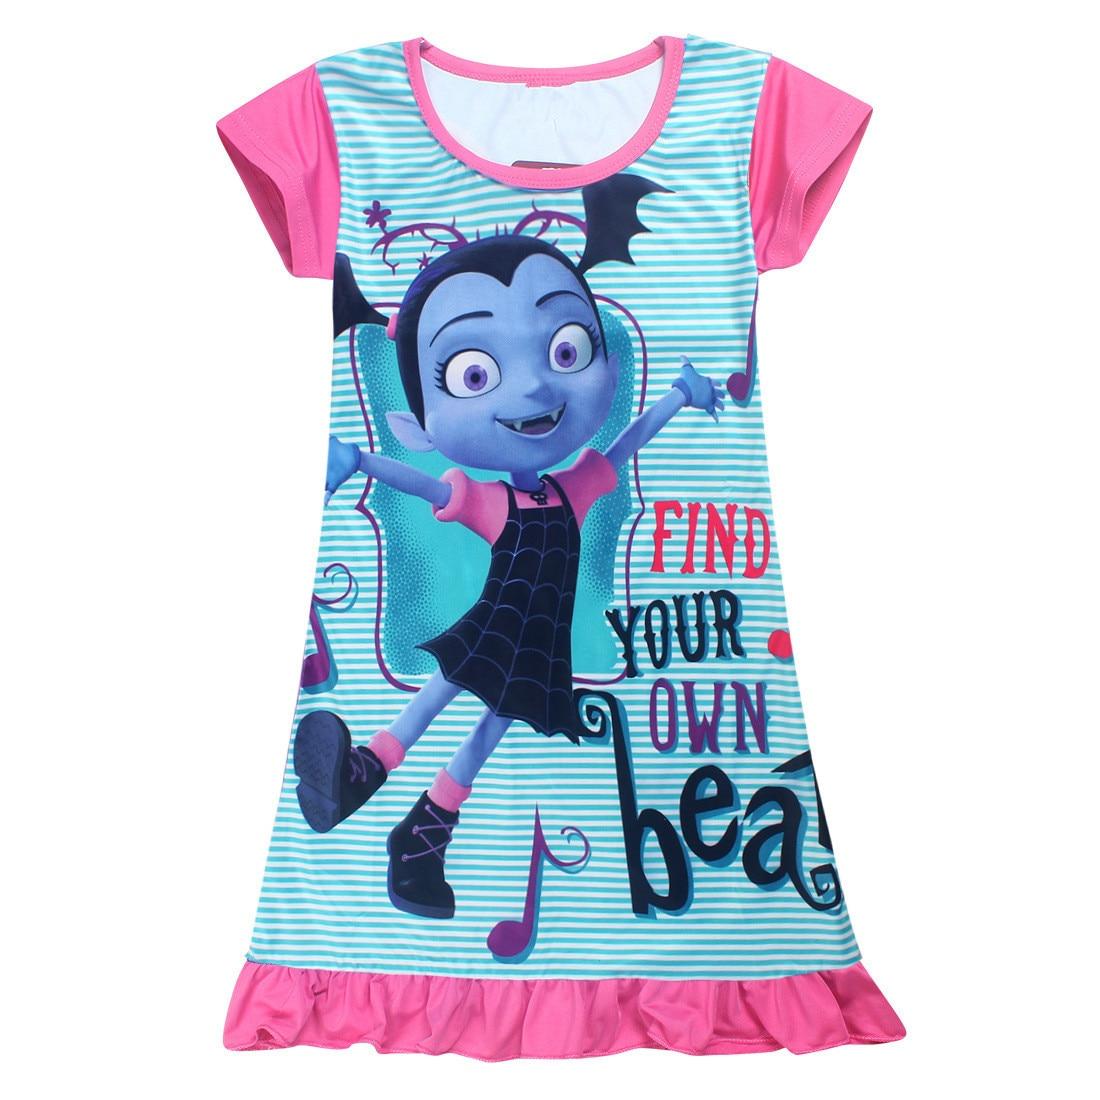 Elsa Junior Vampirina Vamp Batwoman Mädchen Kleid Sommer Kind ...